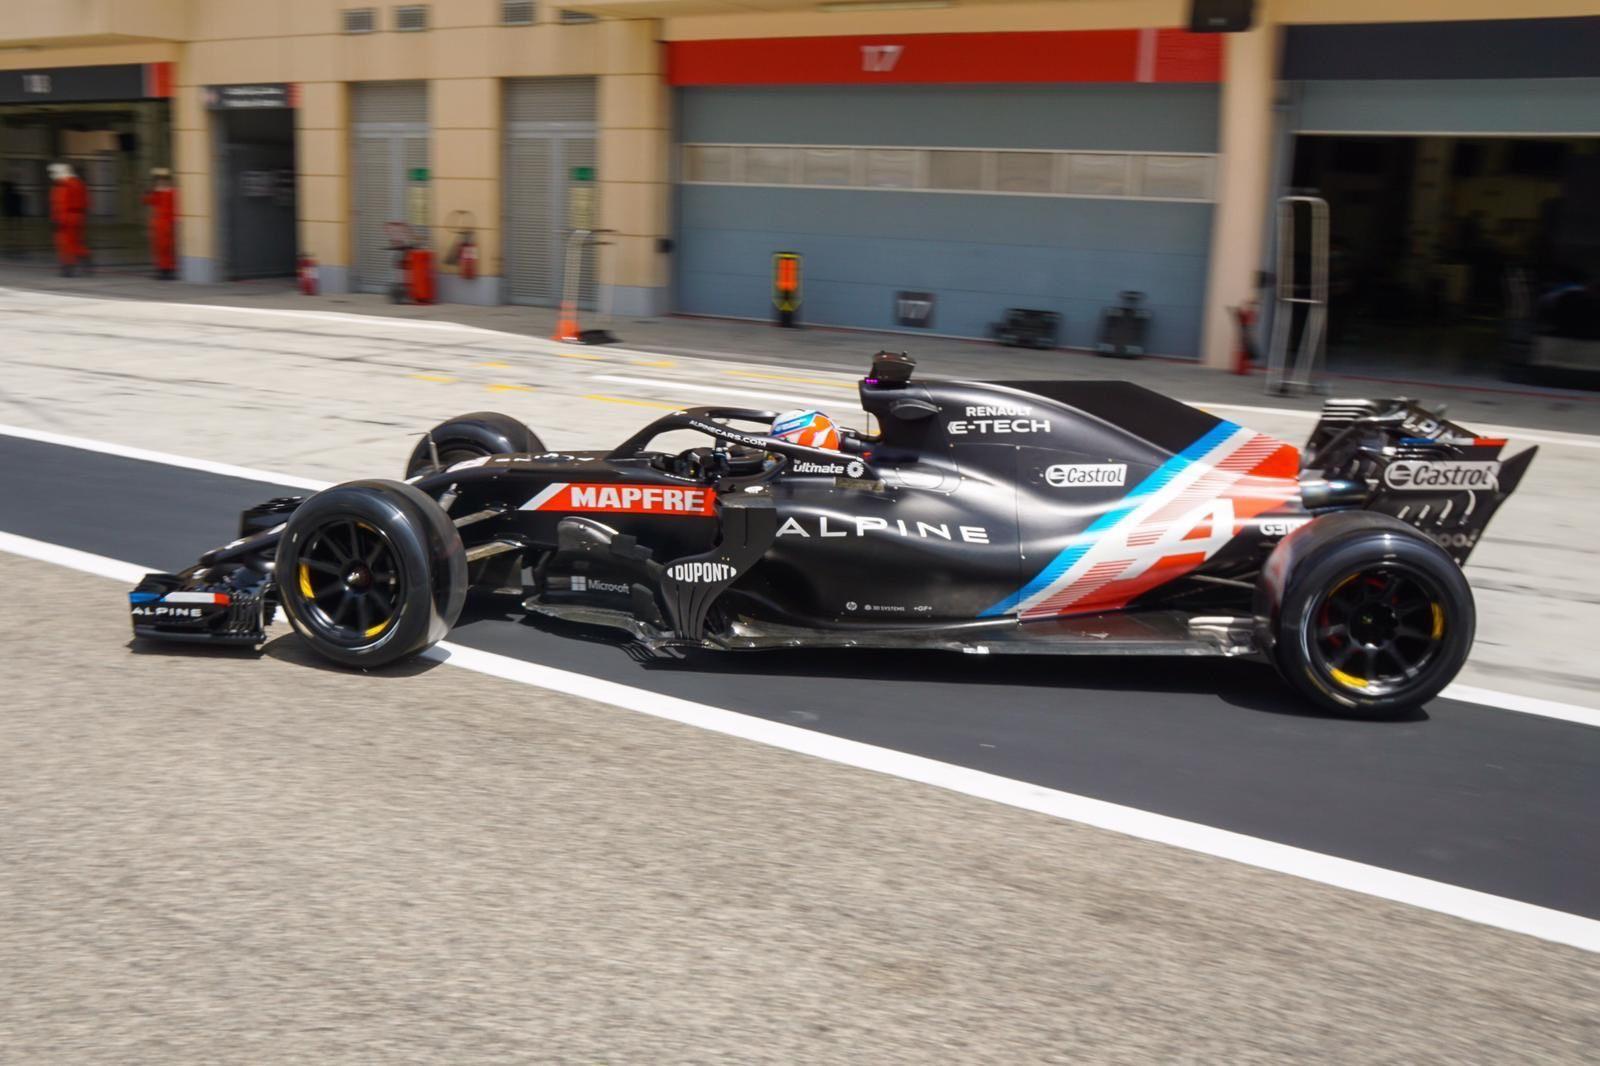 F1, Pirelli, Ferrari, Alpine